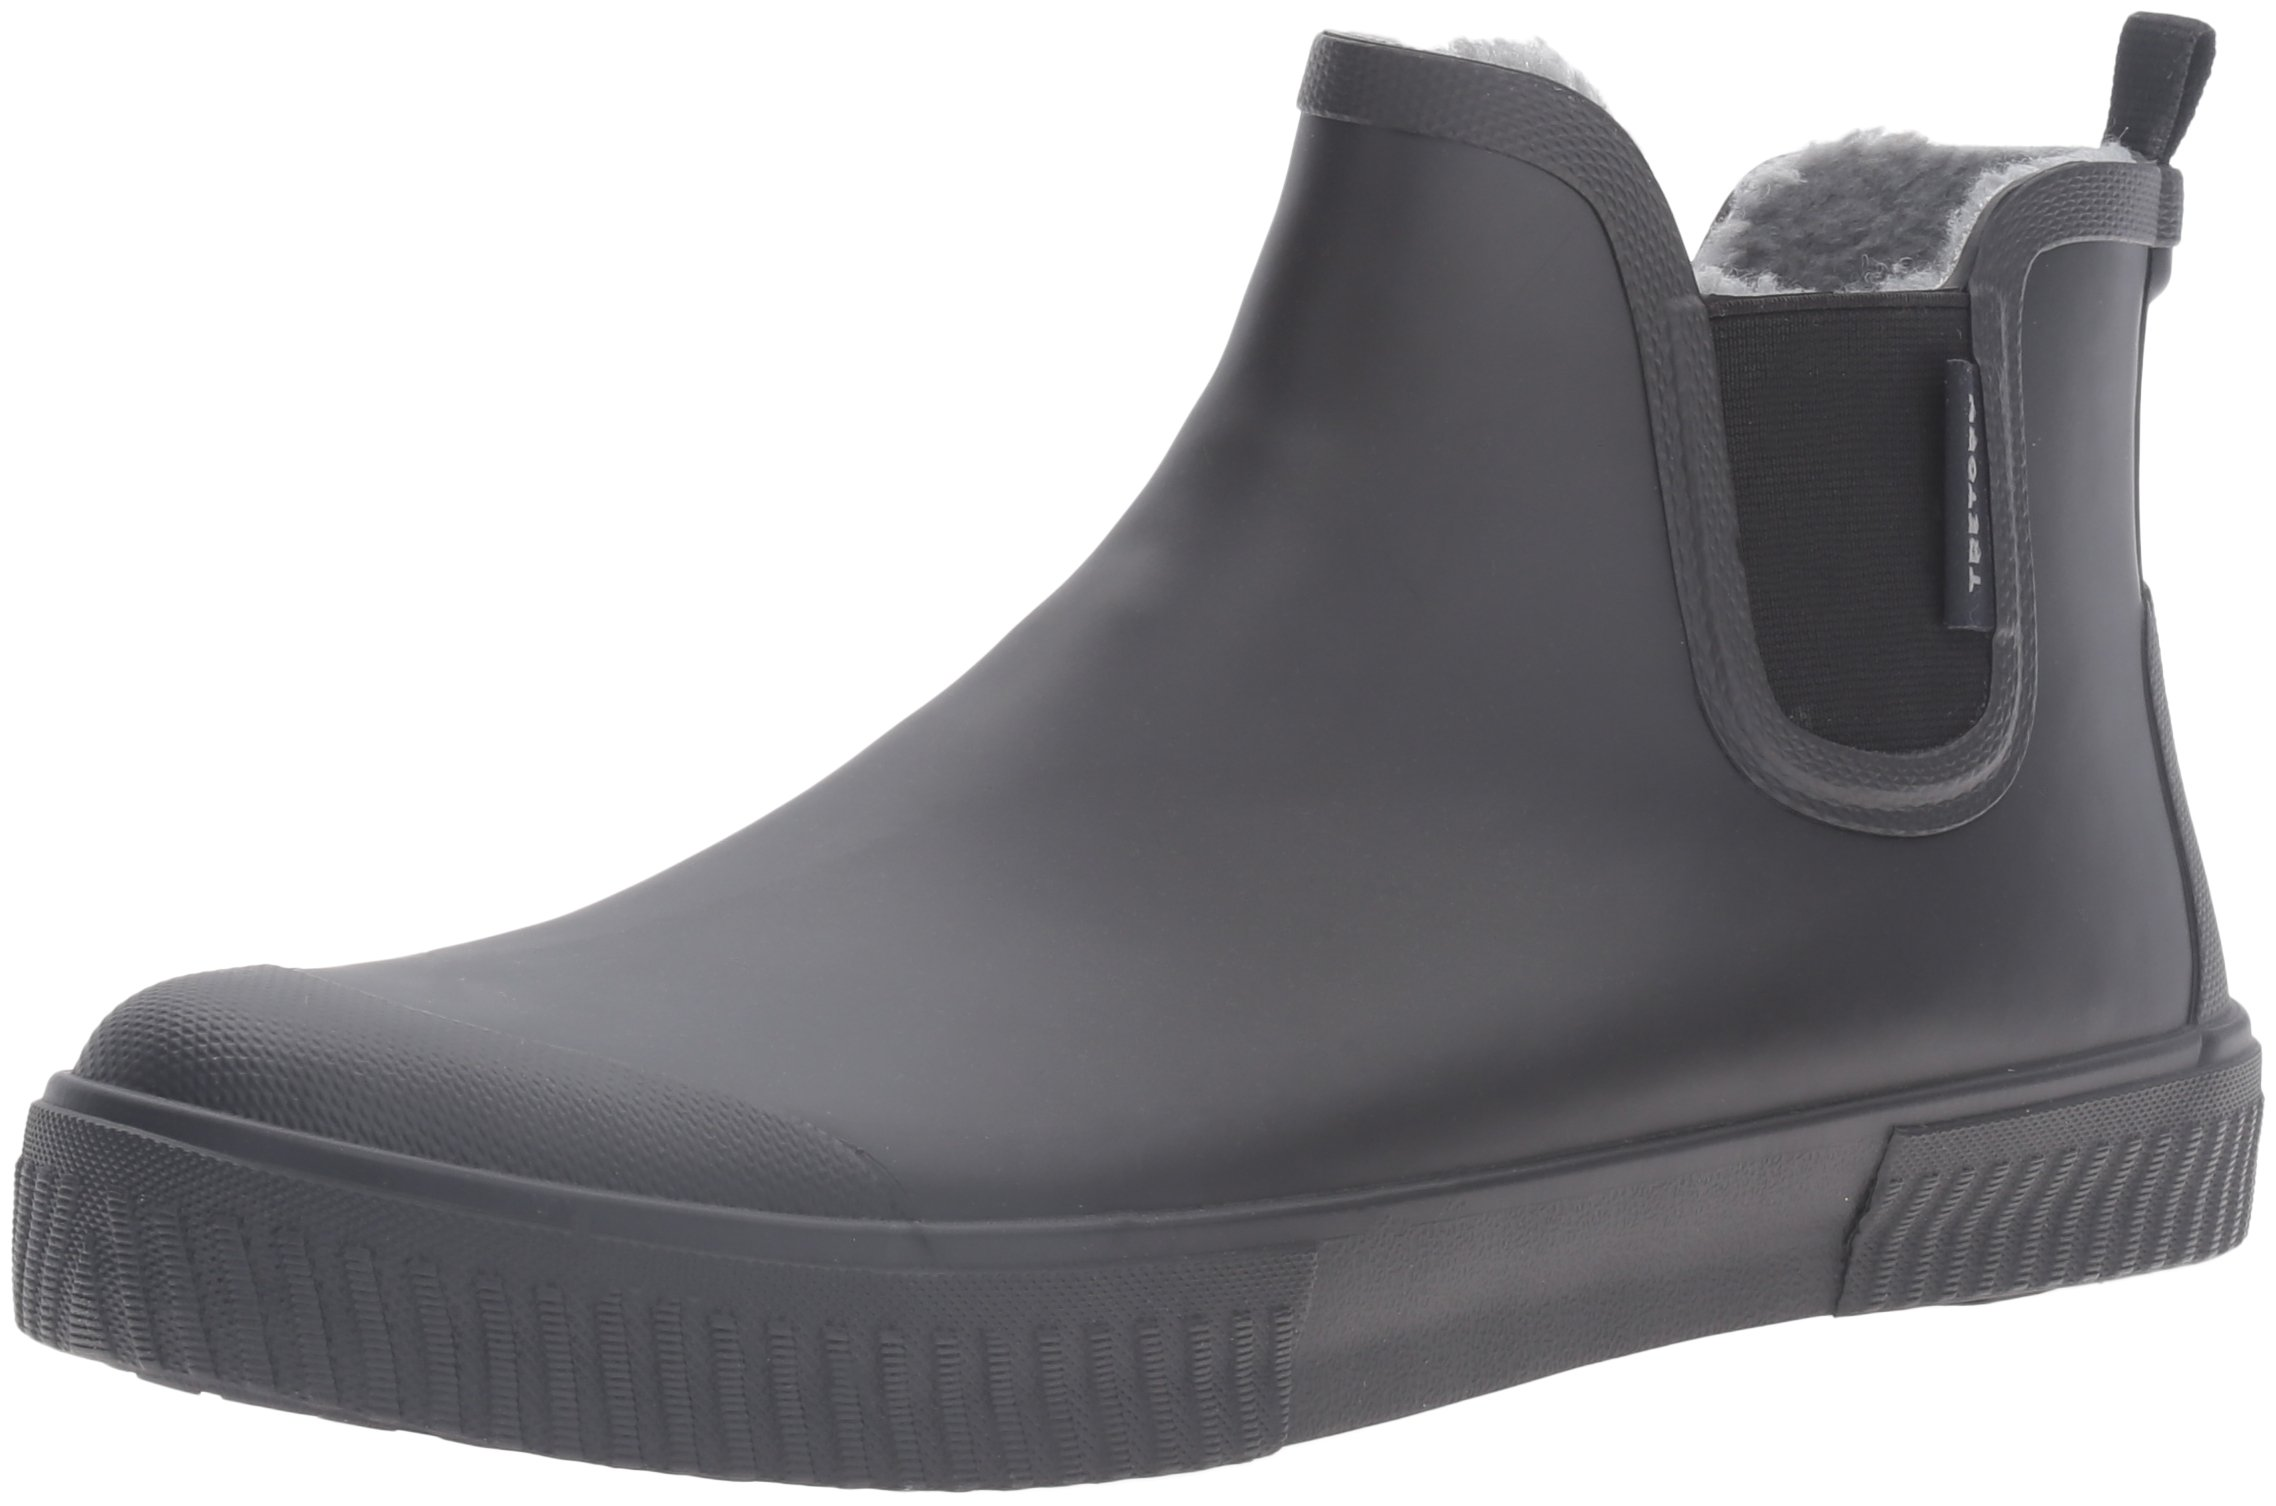 Tretorn Men's Gus Wnt Rain Boot, Black/Black/Black, 8 M US by Tretorn